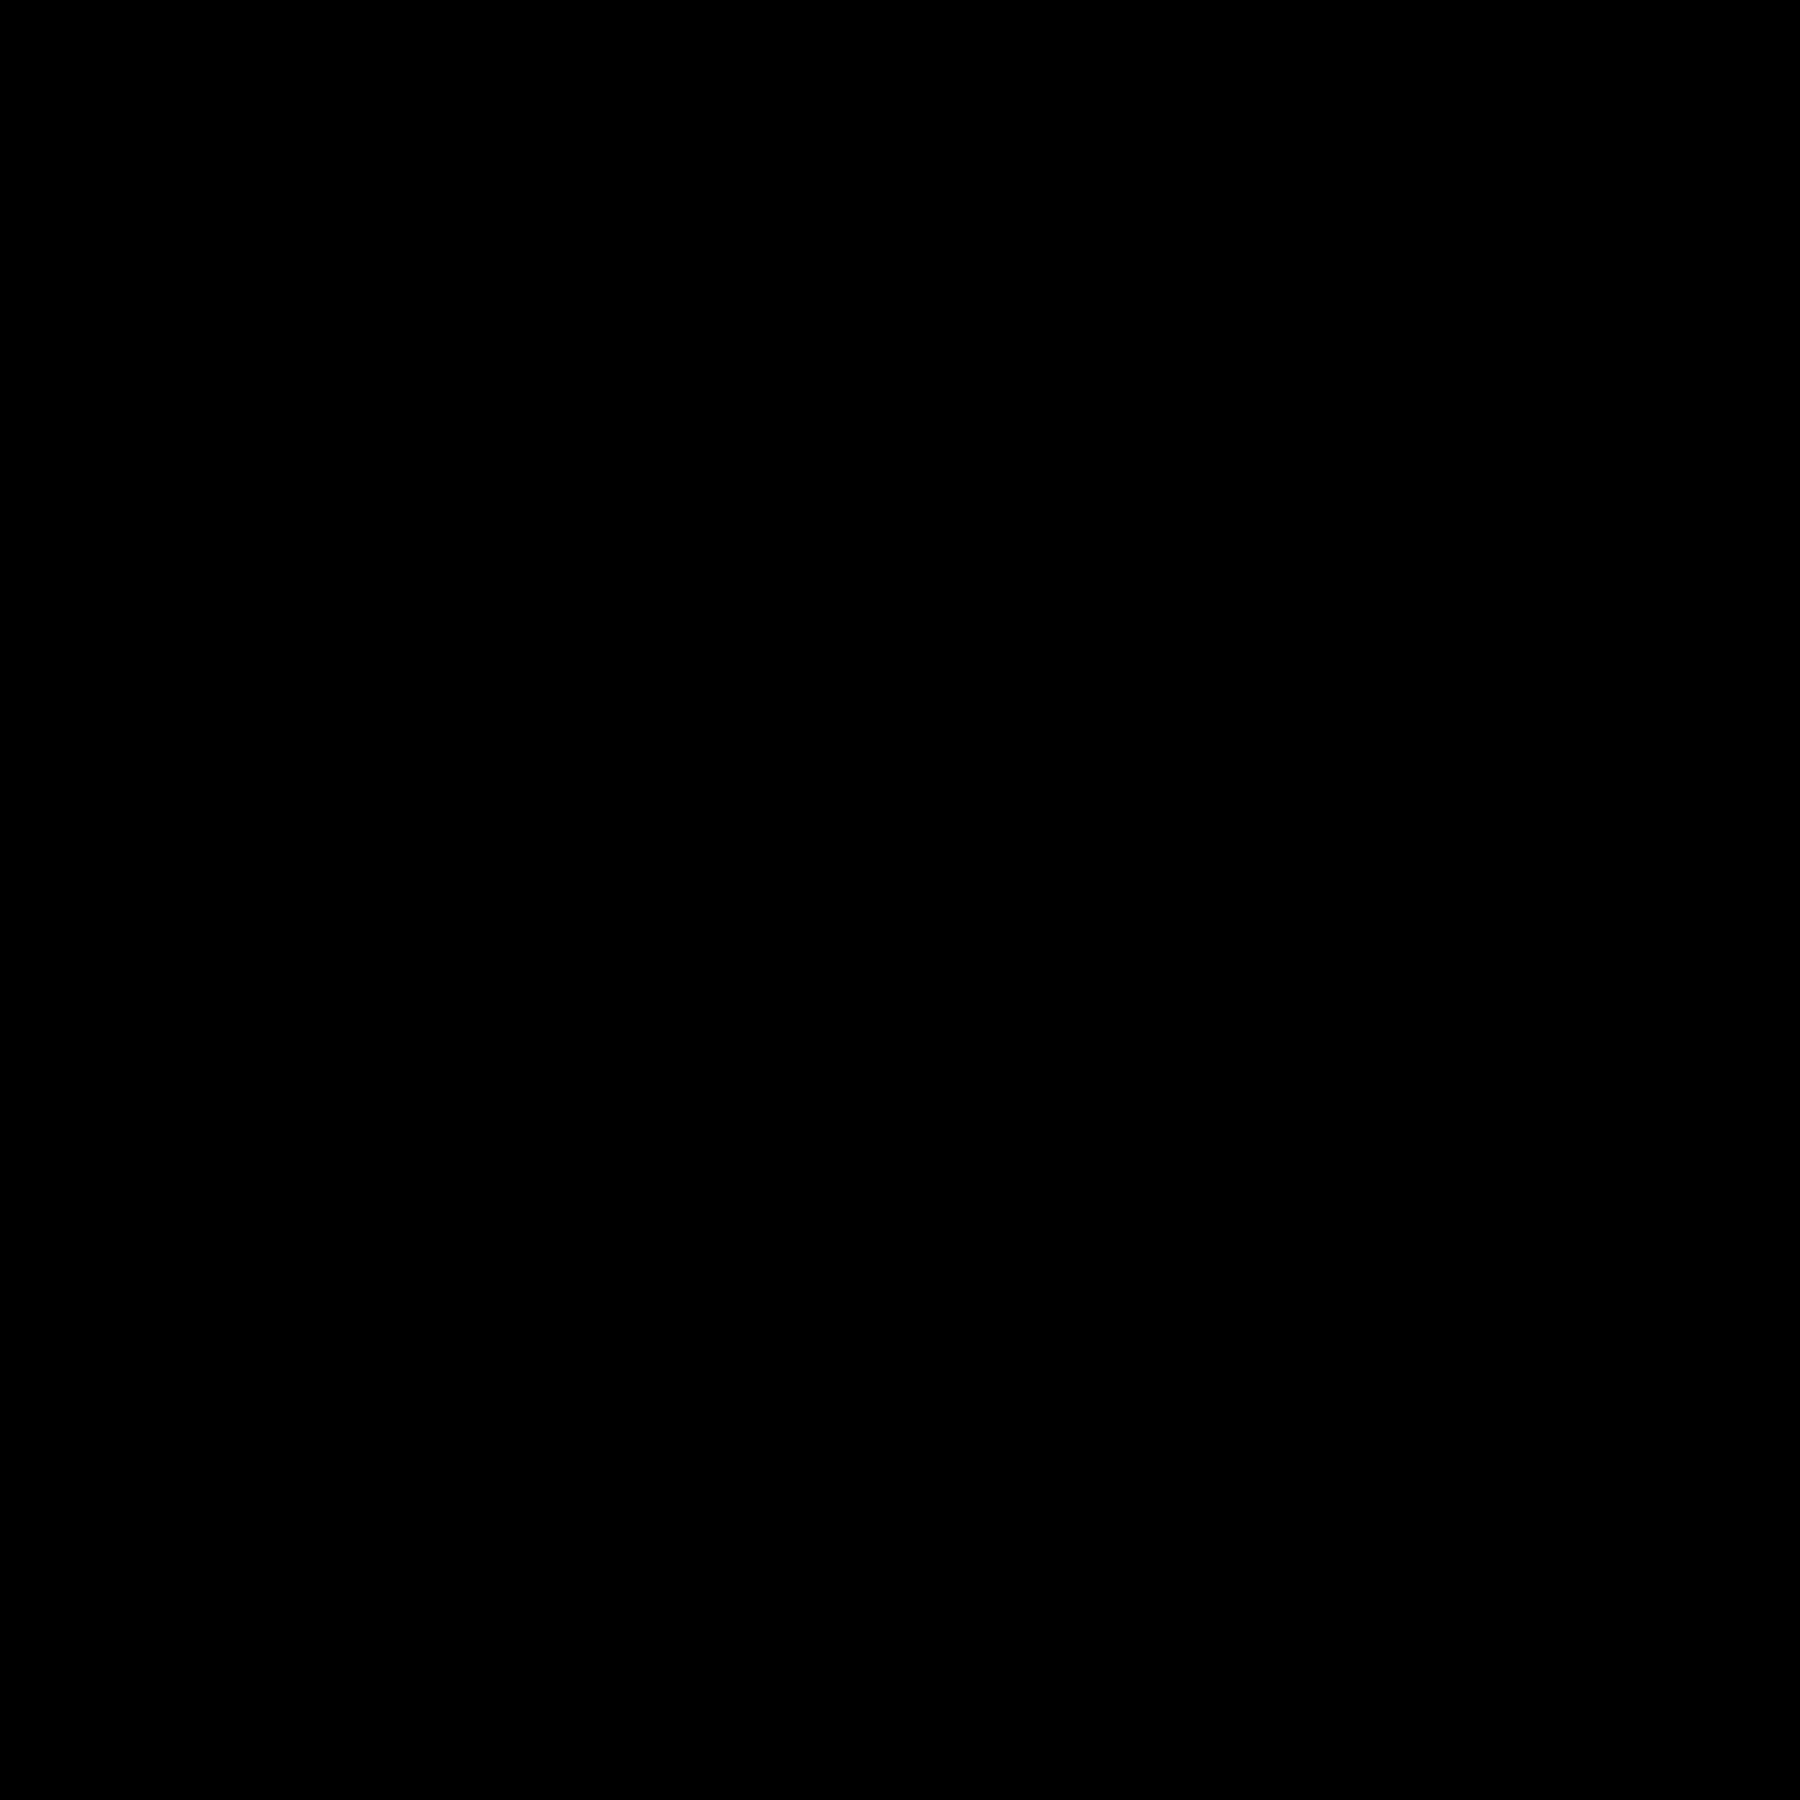 Basic Symbols-11.png